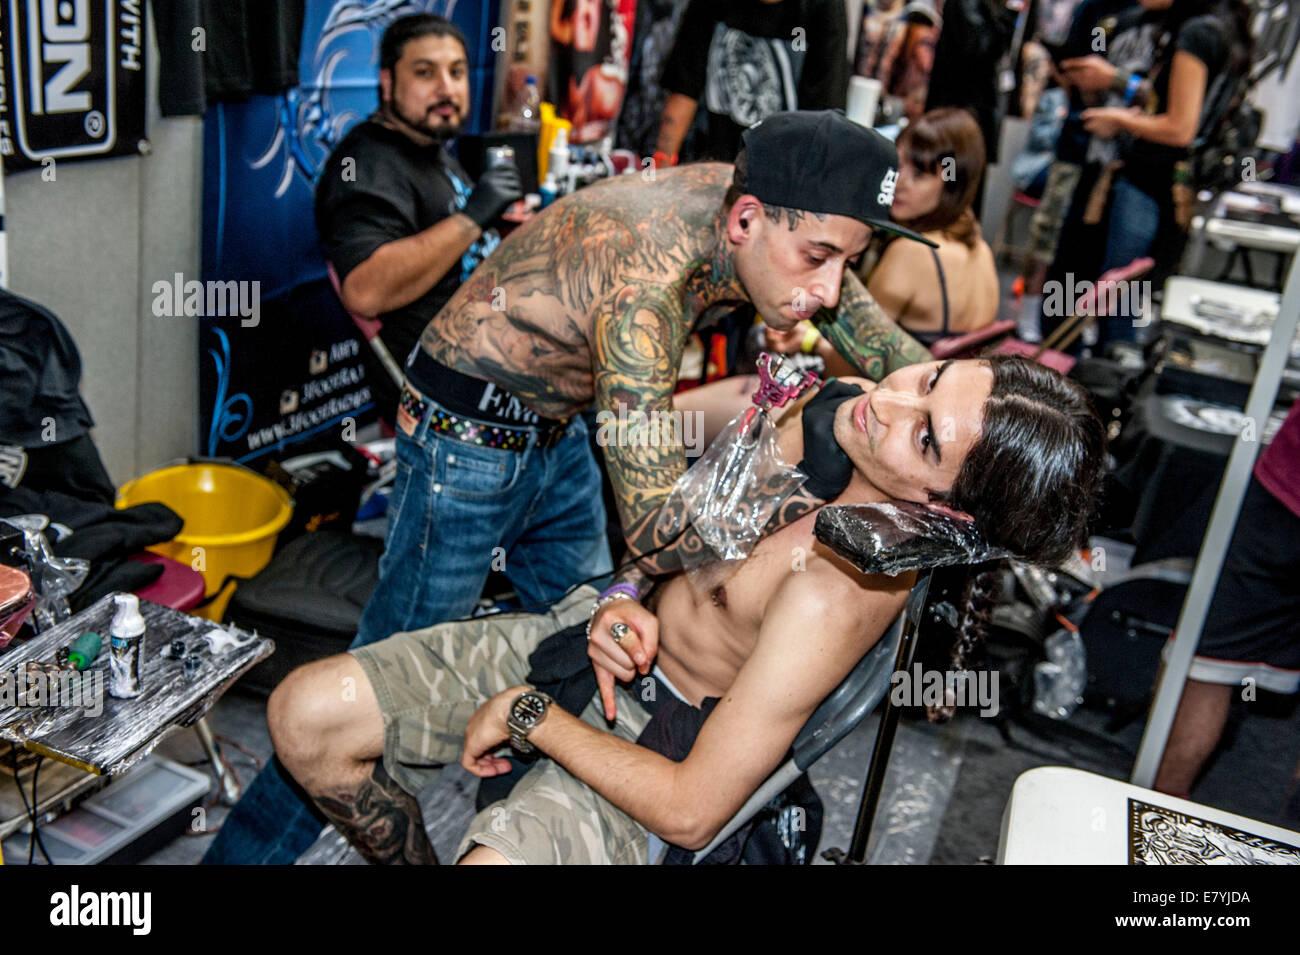 London, UK. 26th Sep, 2014. 10th International Tattoo Convention Tobacco Dock , London UK Friday 26 September - Stock Image